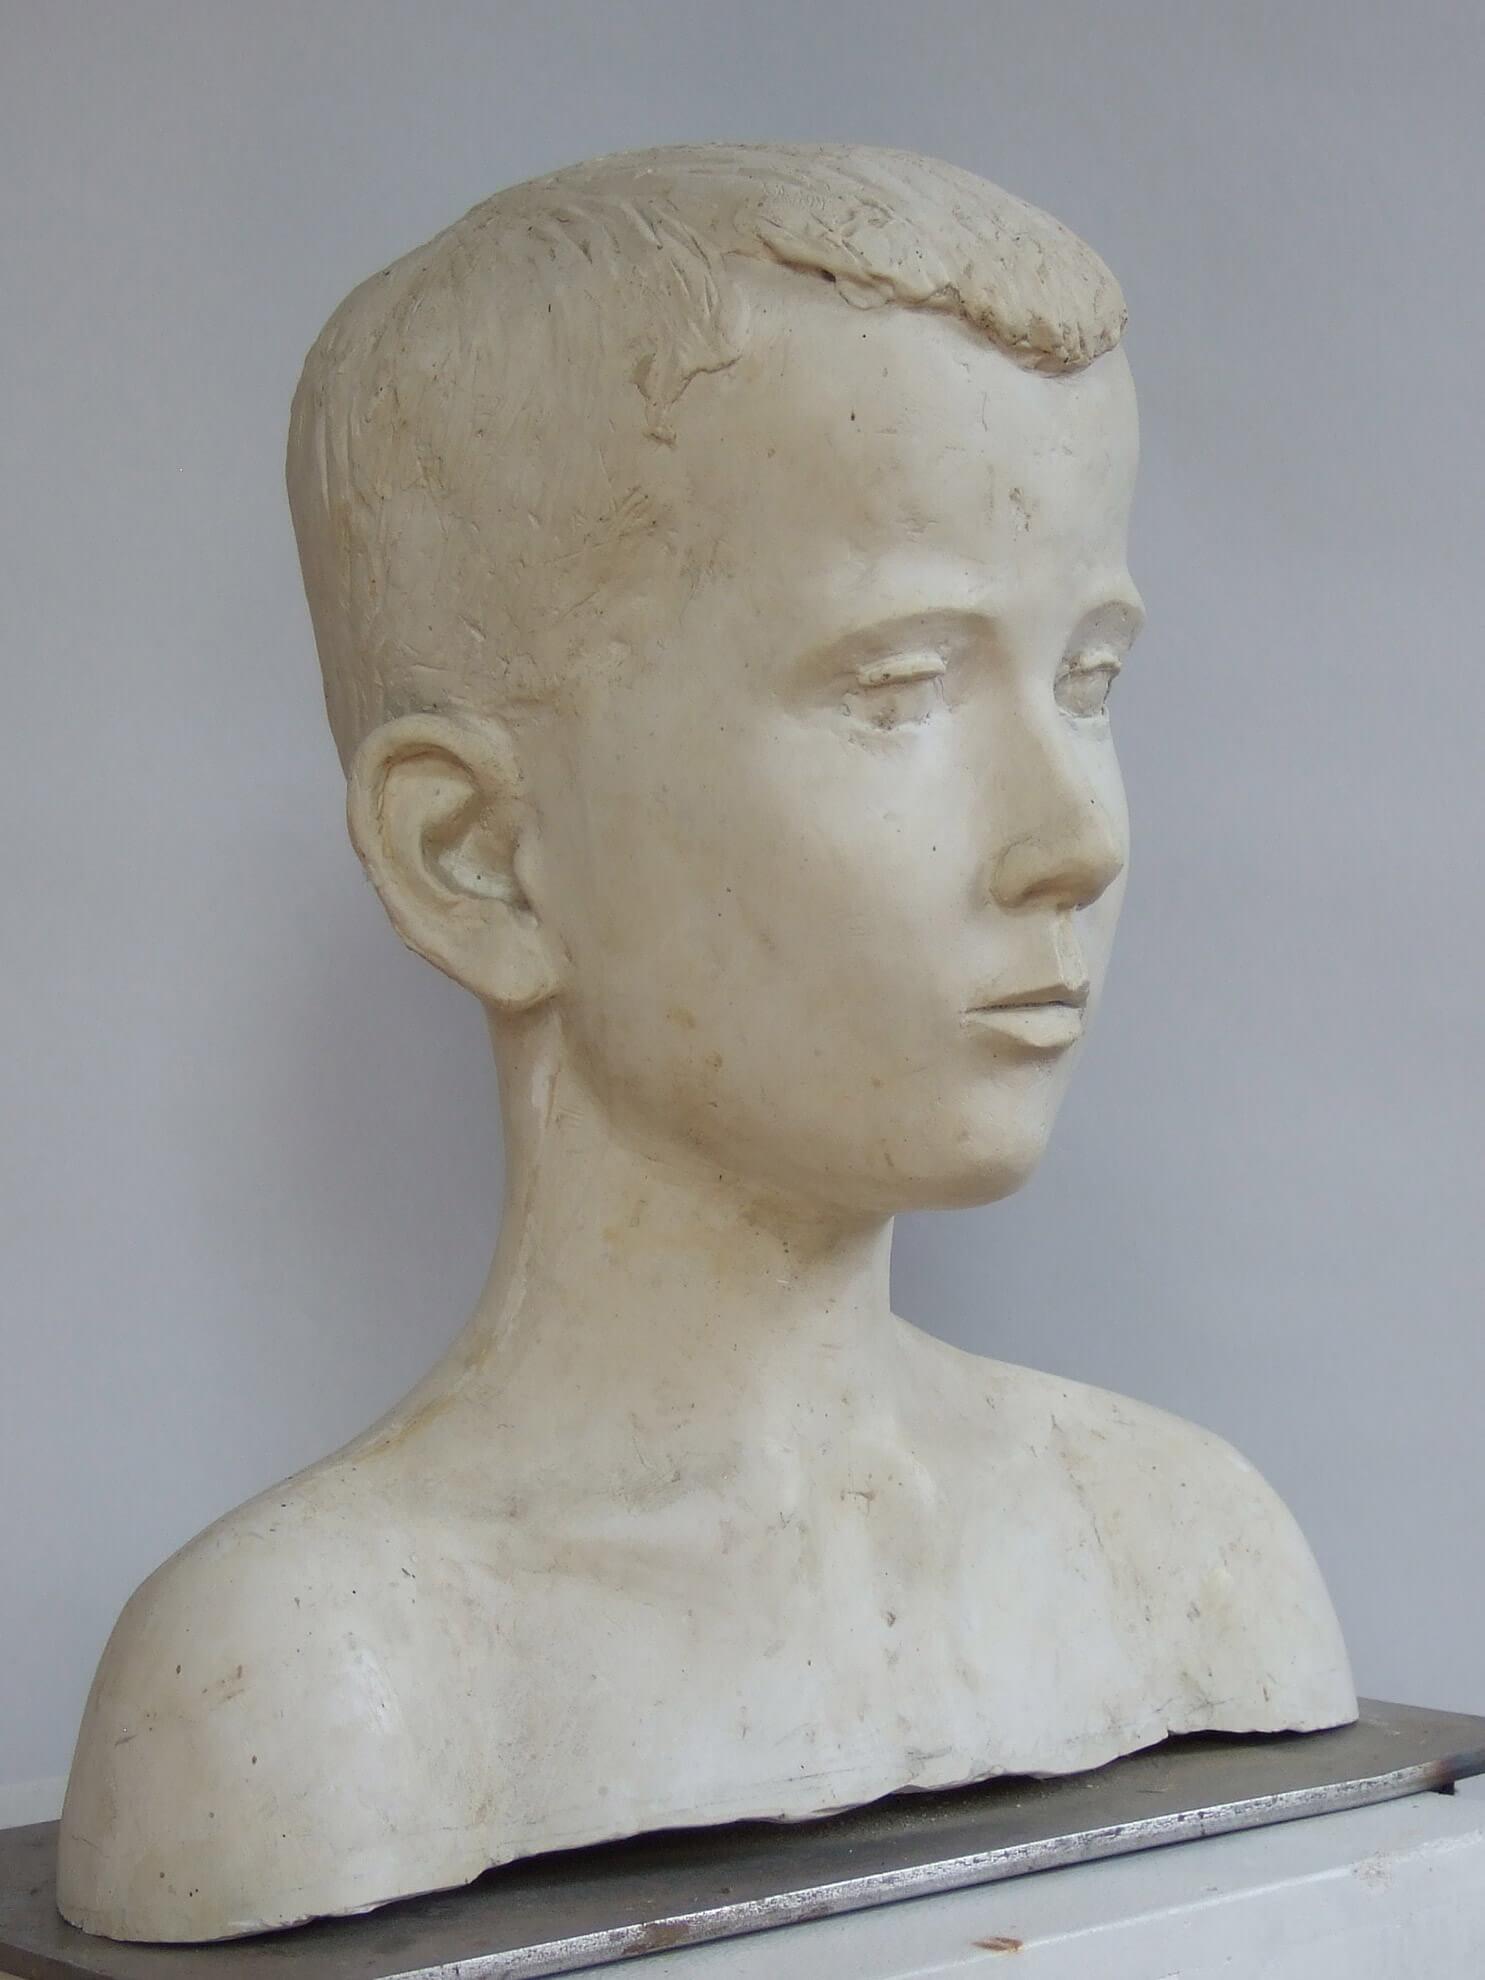 A. v. Boetticher, 2002, Gips